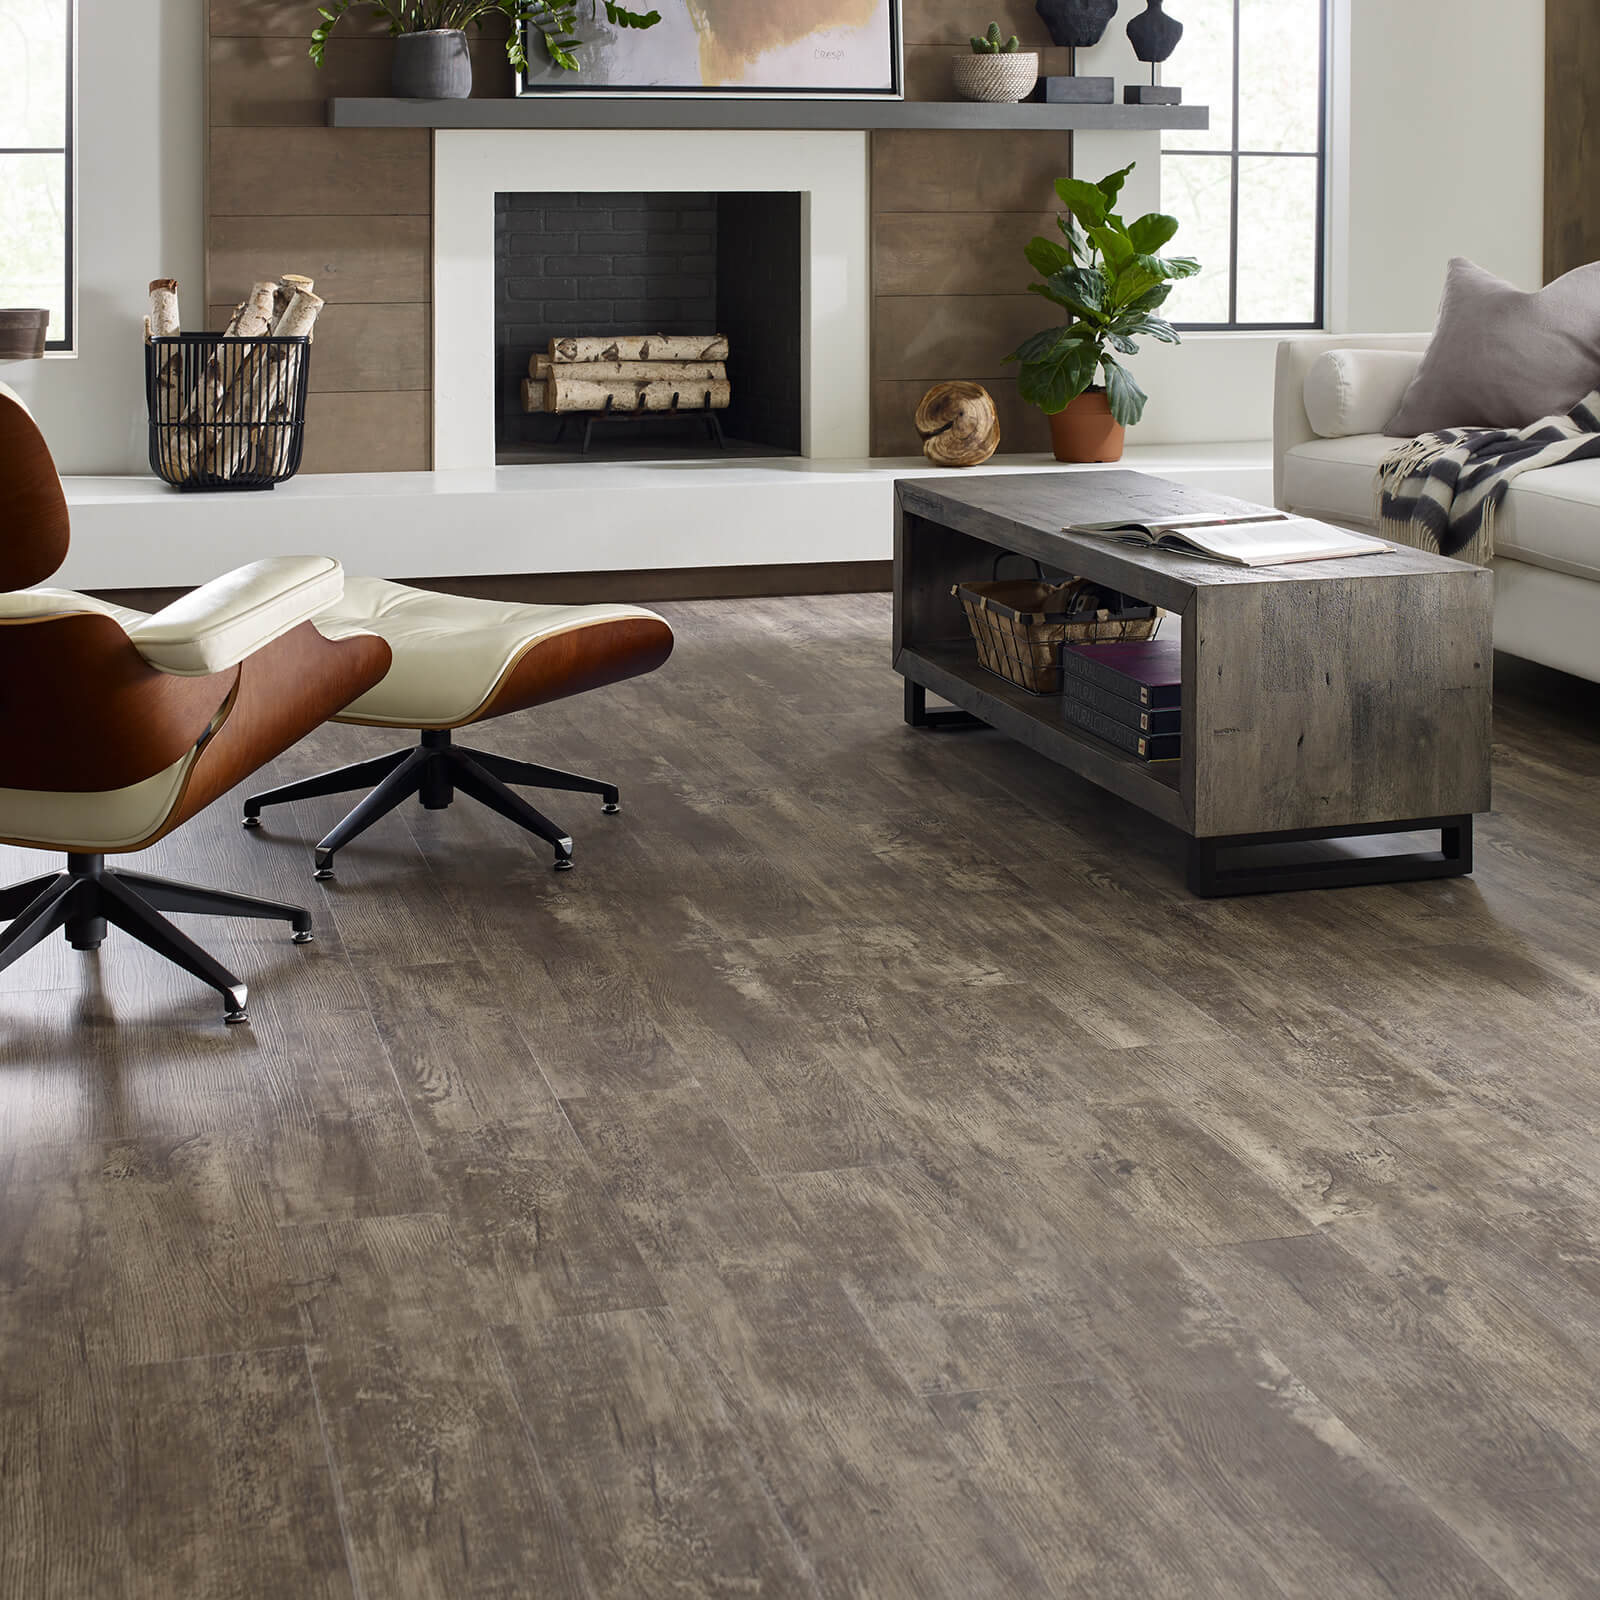 Hardwood Flooring | Christian Brothers Flooring & Interiors.